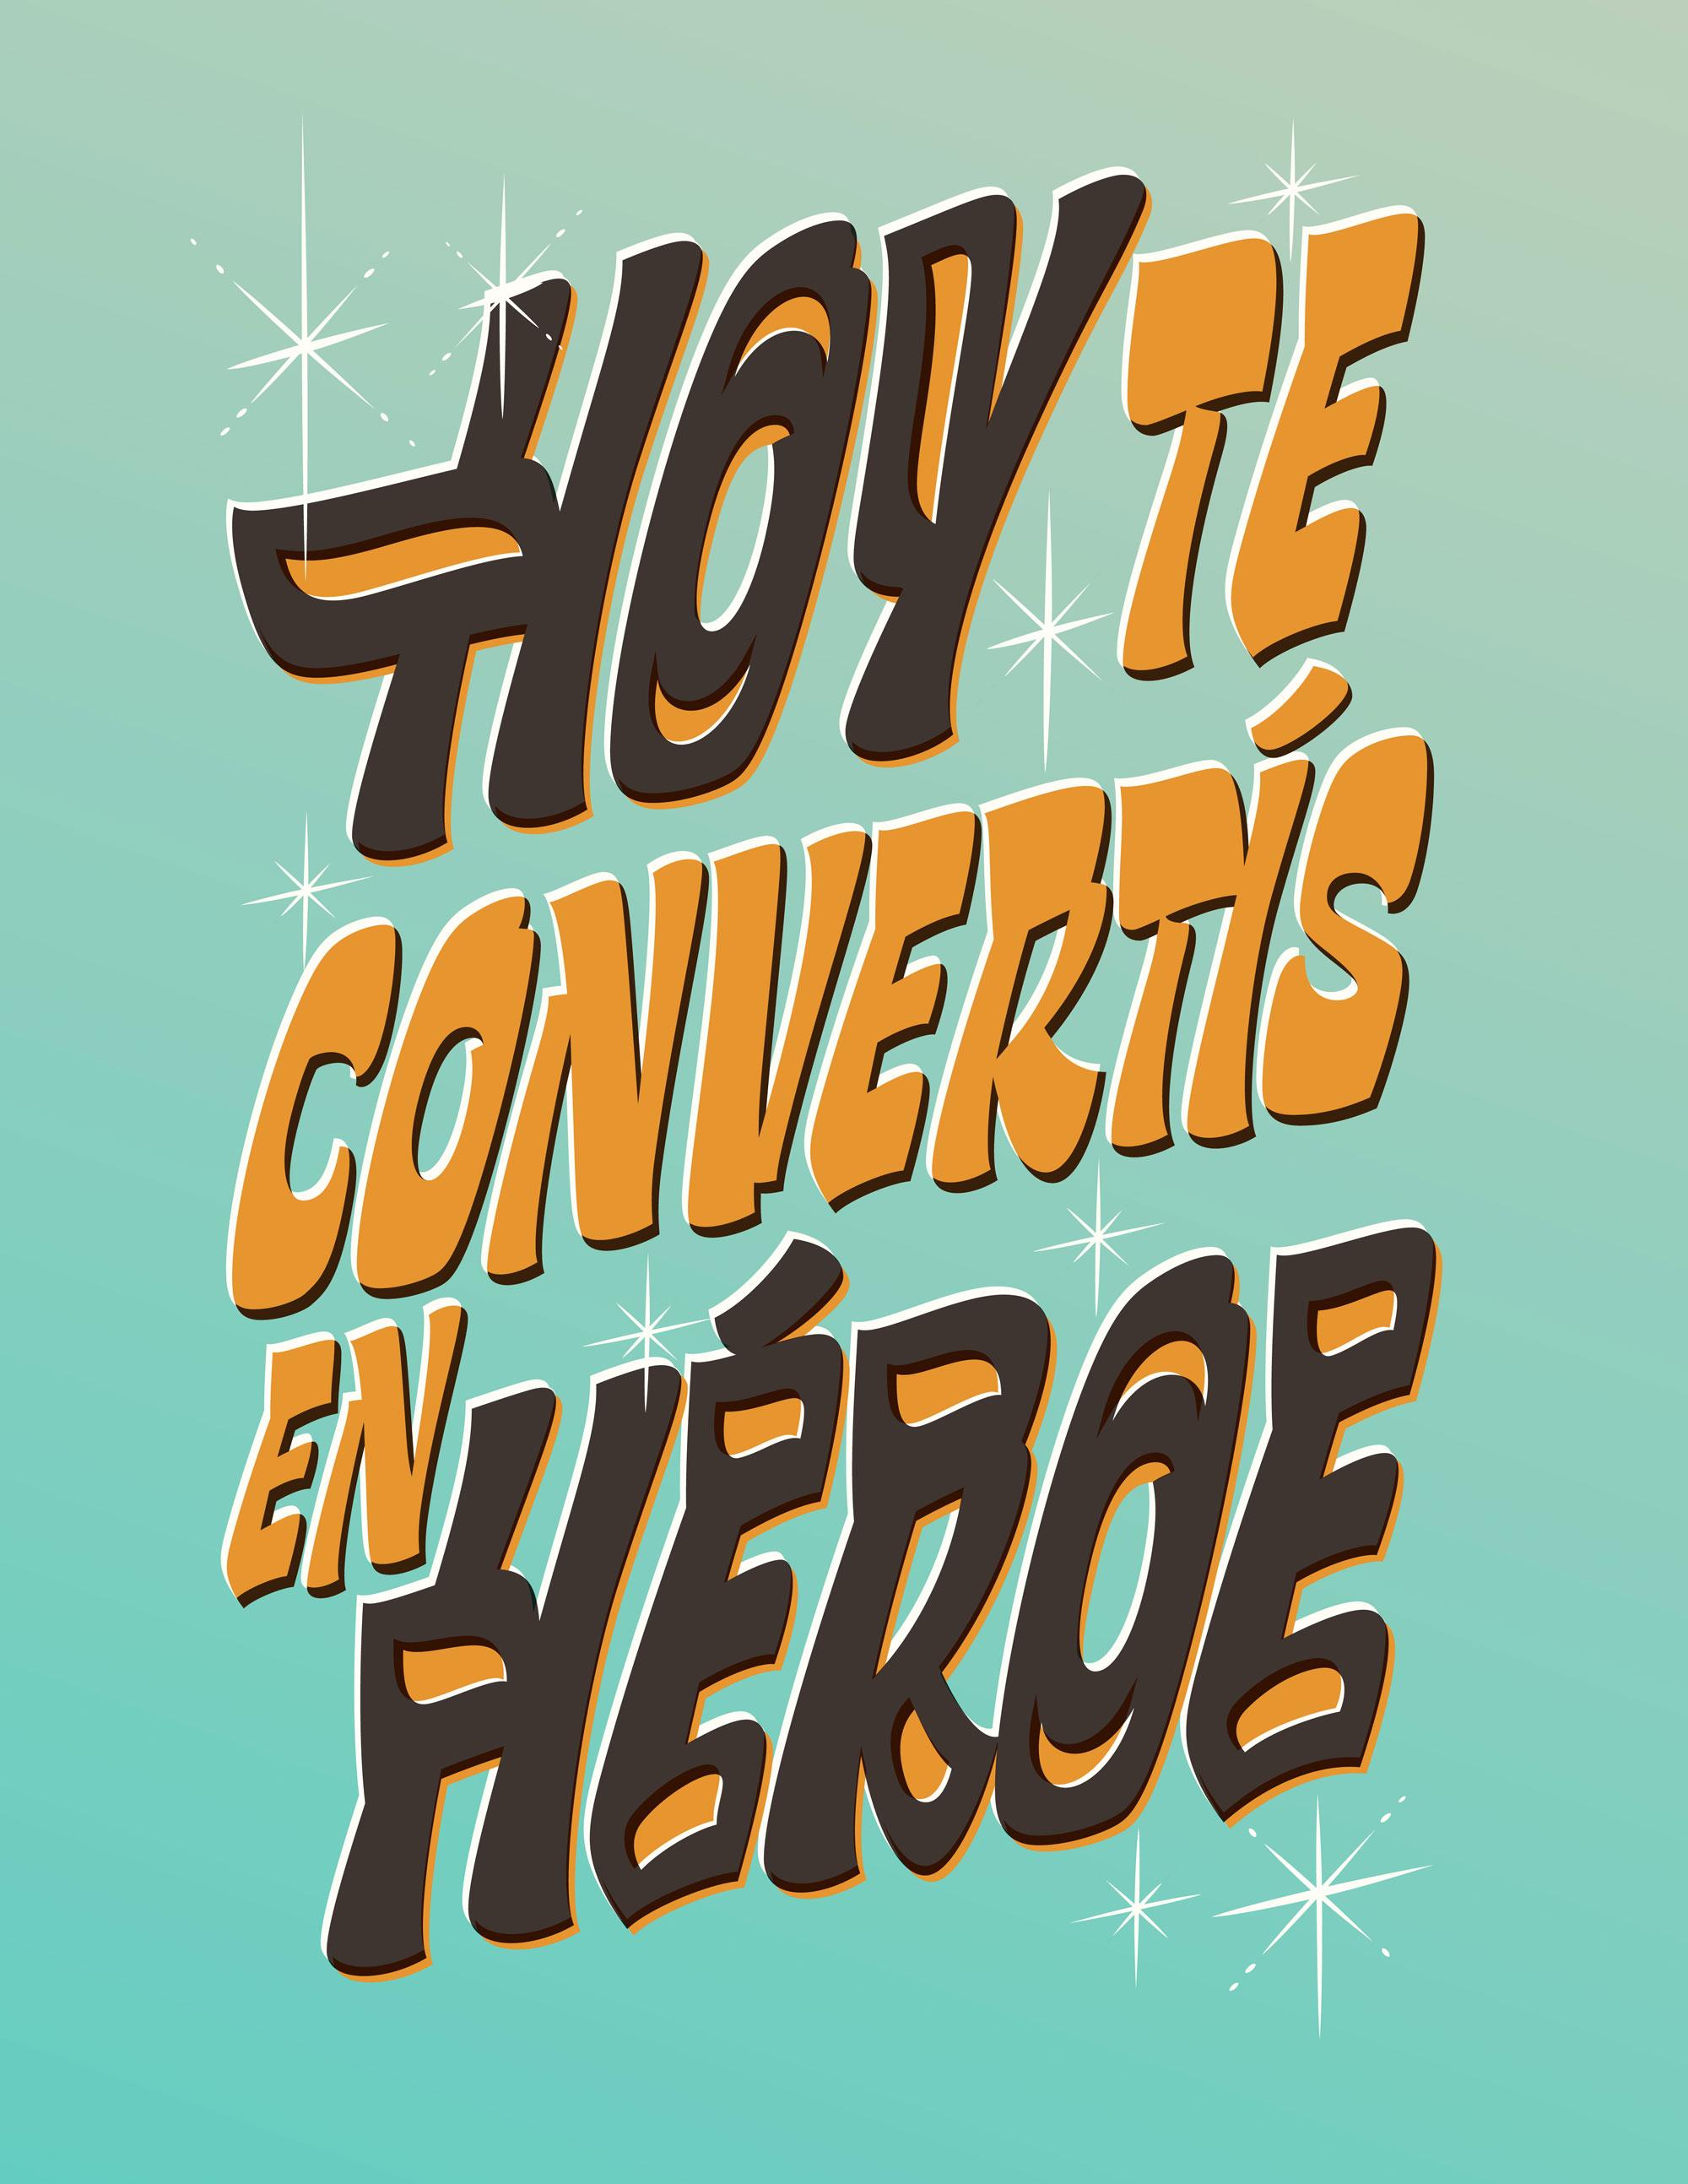 HOY_TE_CONVERTIS_EN_HEROE_Yanina-Arabena_Guillermo-Vizzari_02.jpg